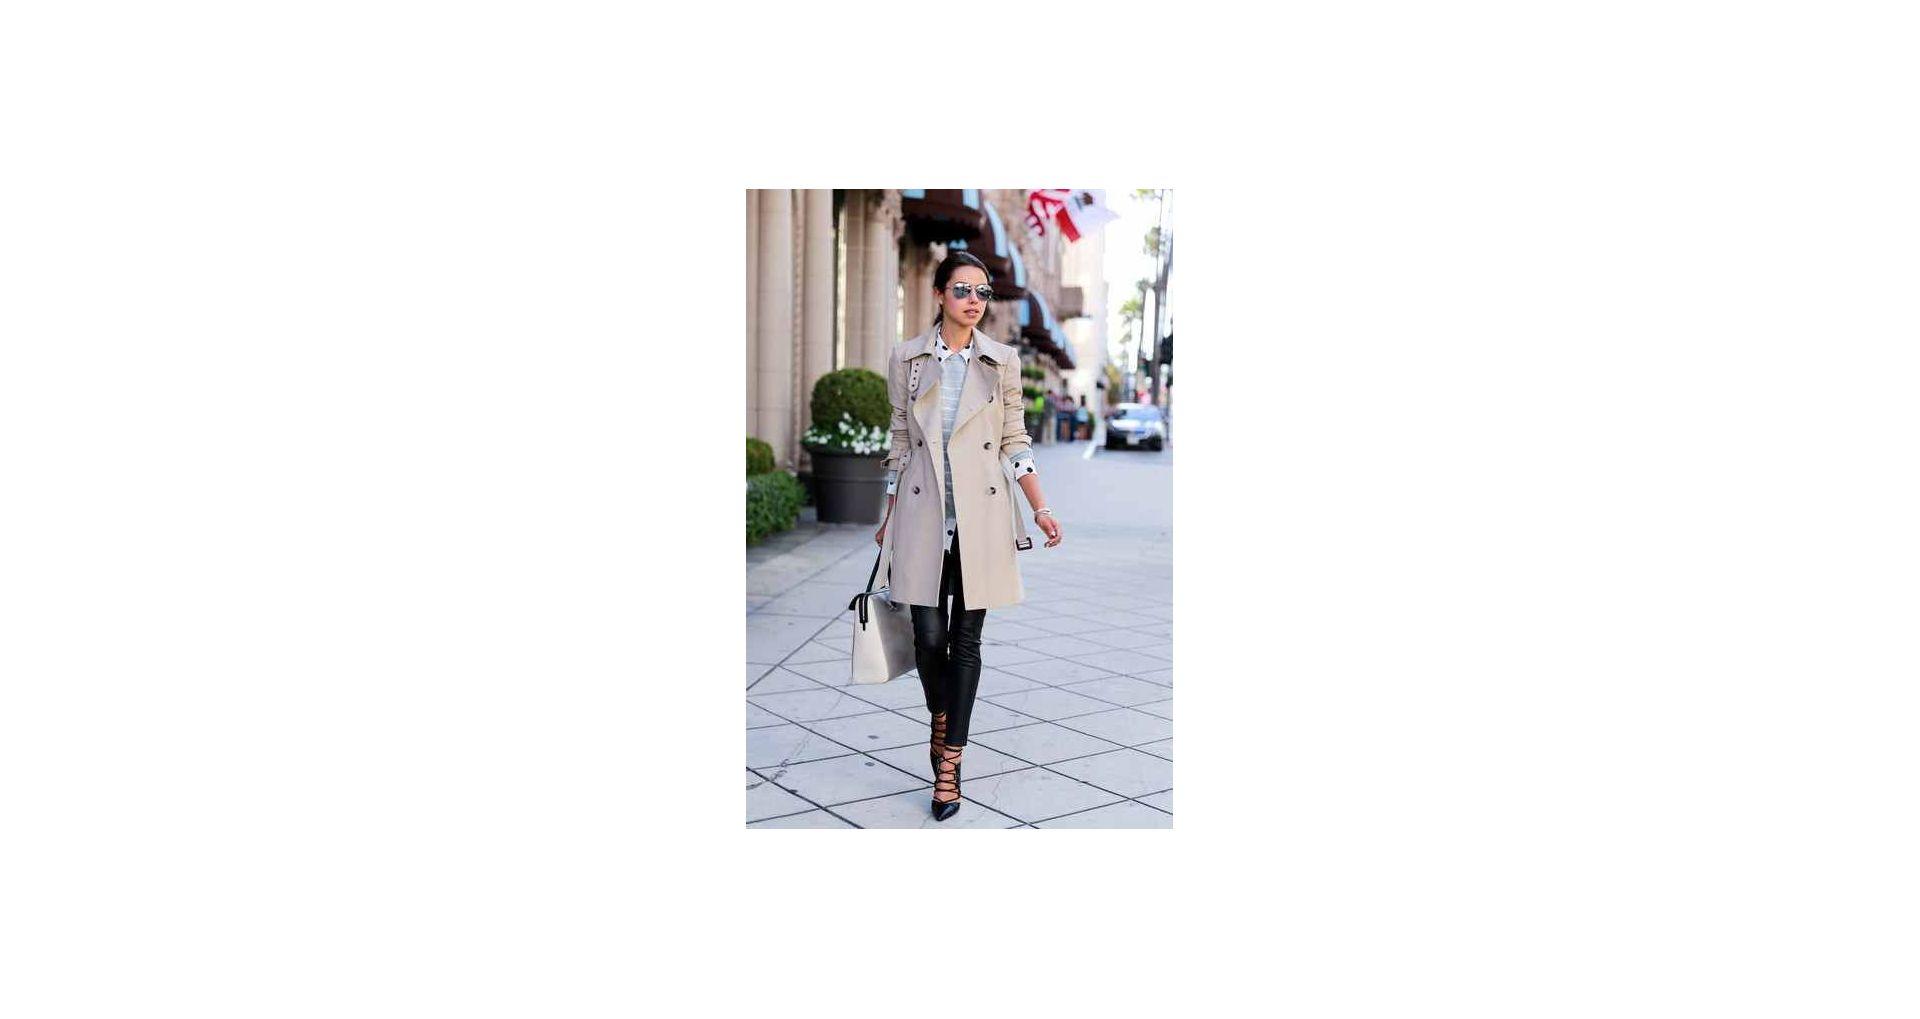 Palton dama, colectii noi 2019, preturi imbatabile